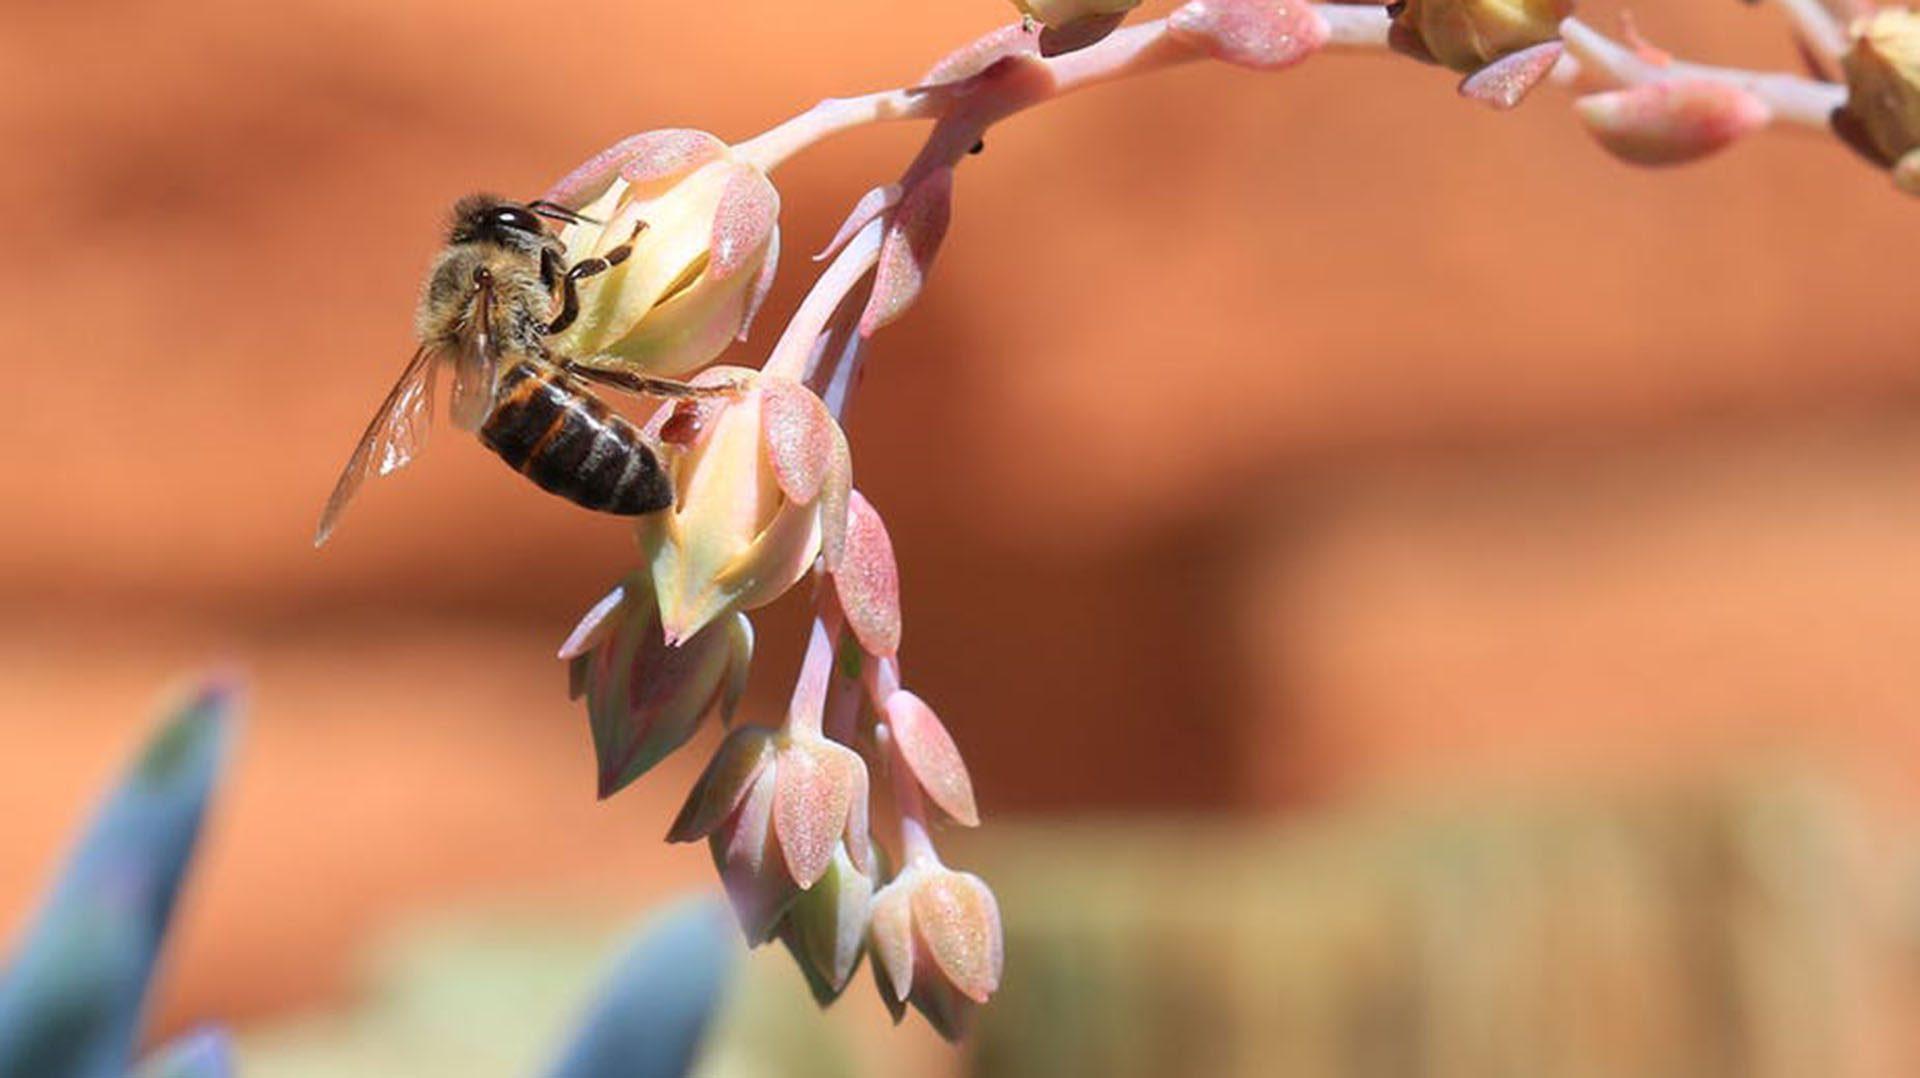 Cape Honeybee gathering pollen from a rock rose flower - South Africa. Photo: Shutterstock/The Conversation